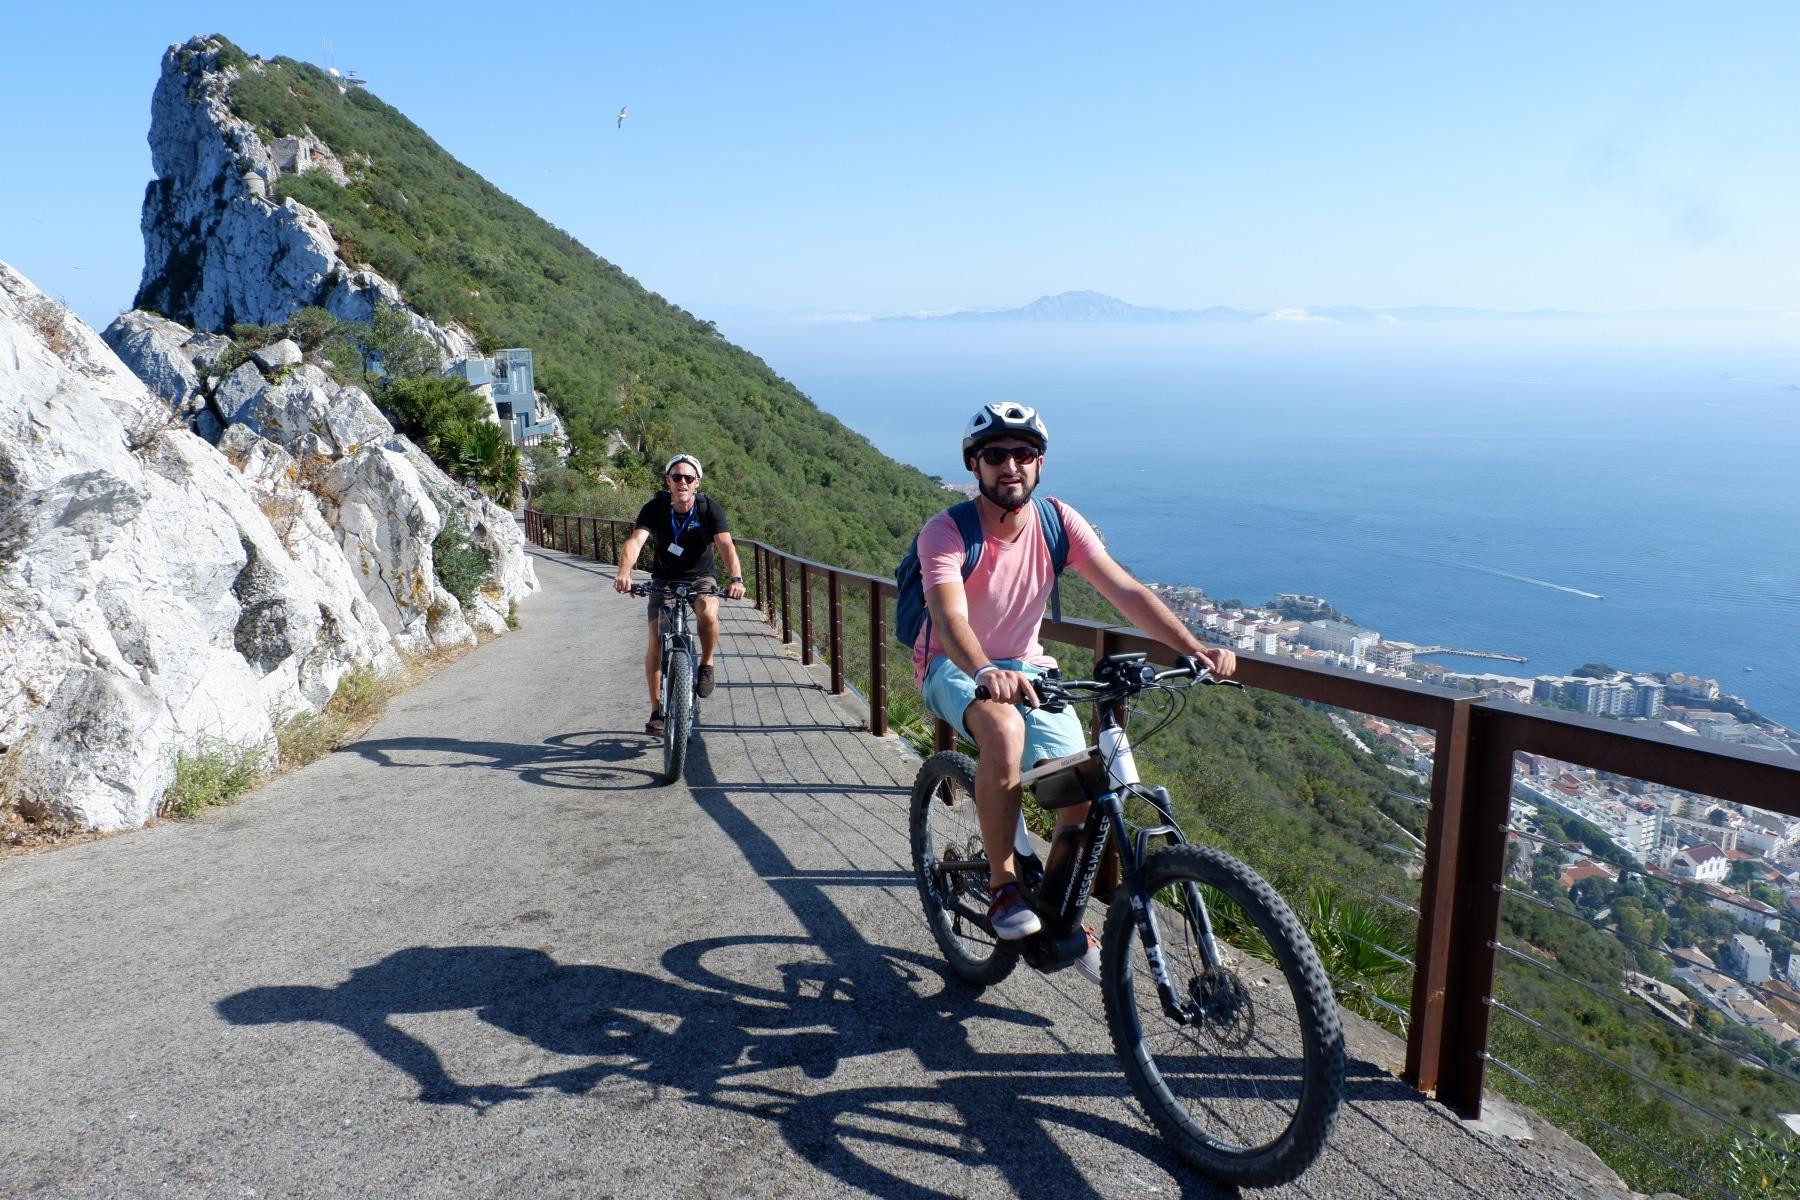 23-jun-2019-blogueros-espaoles-de-viajes-visitan-el-pen_48131154337_o